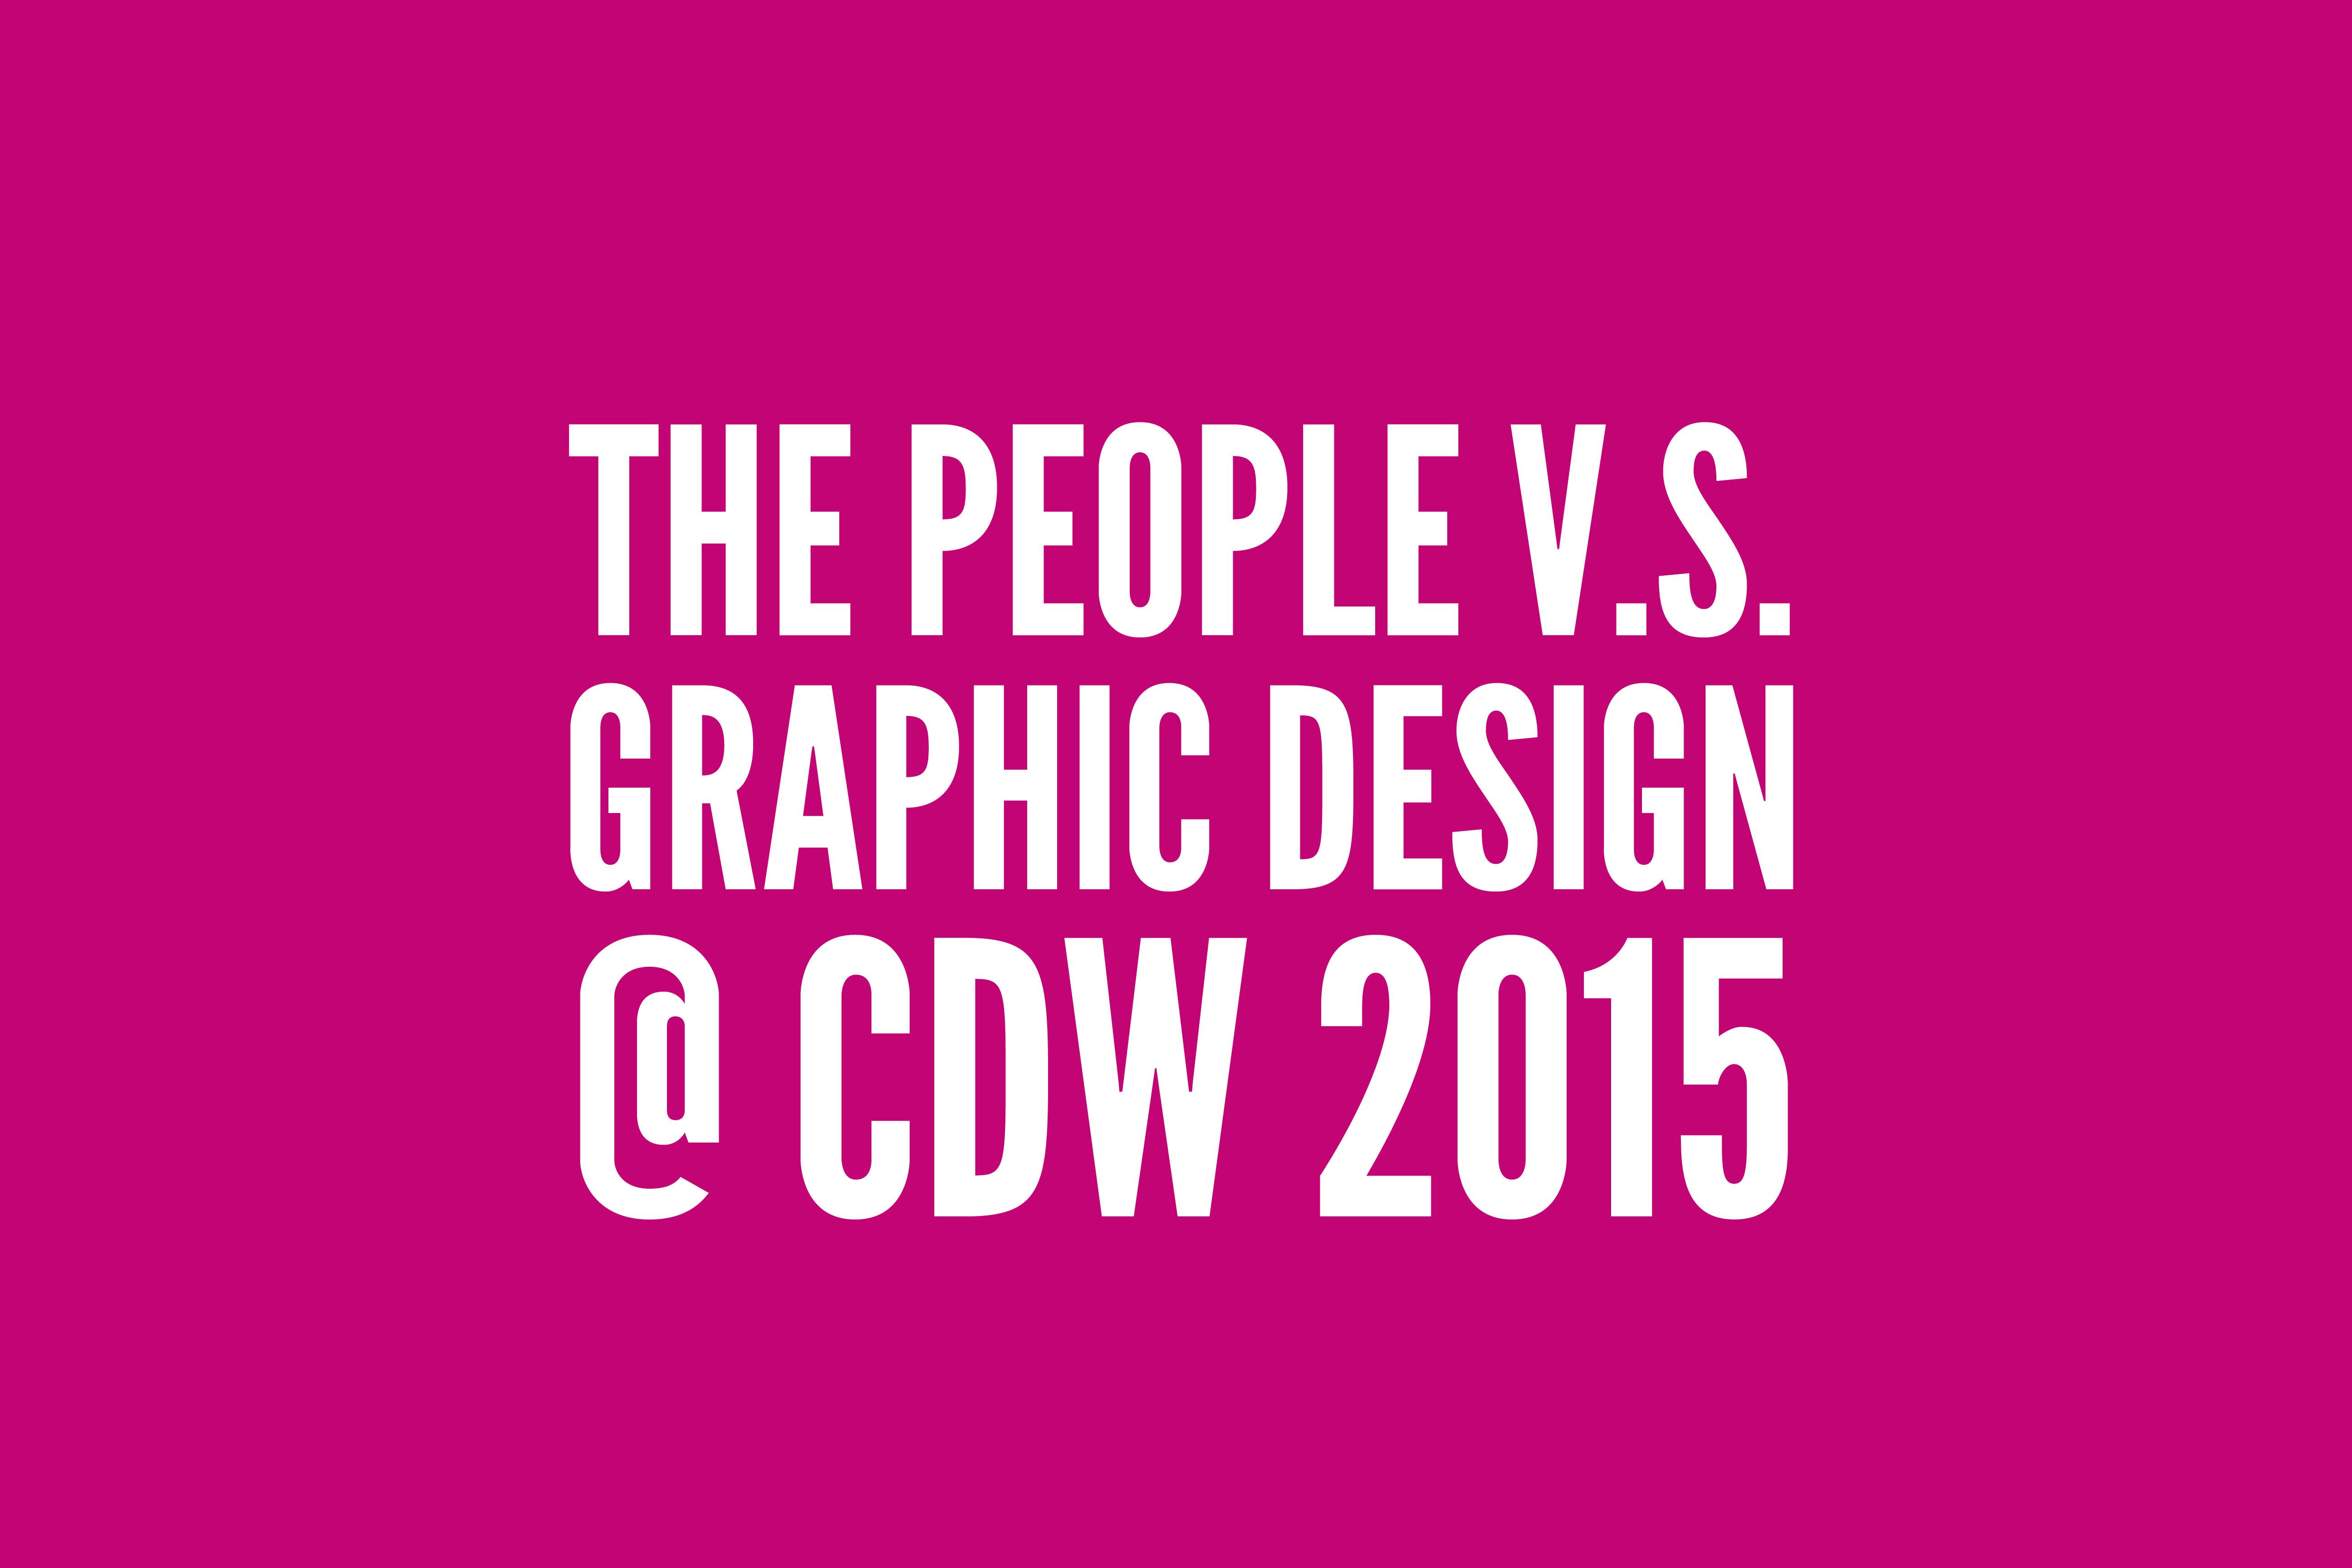 https://graphiquefantastique.com/wp-content/uploads/2015/05/ThePeopleVSGraphicDesign.jpg